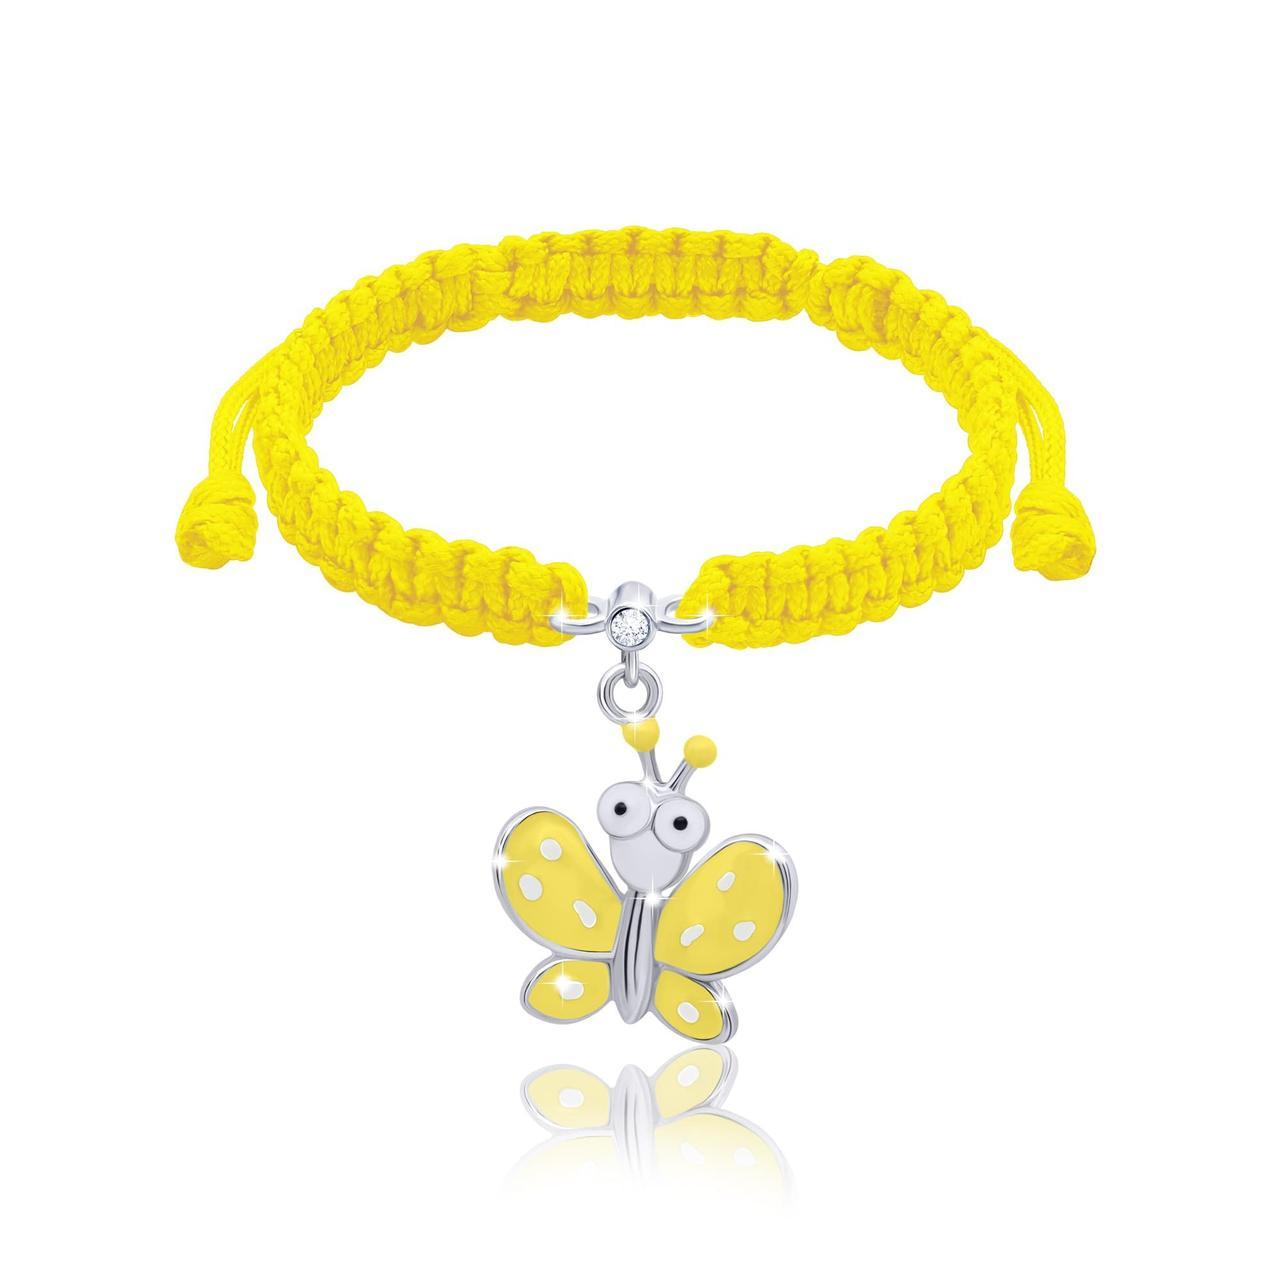 Браслет плетеный Мотылёк с глазами желтый  Желтый